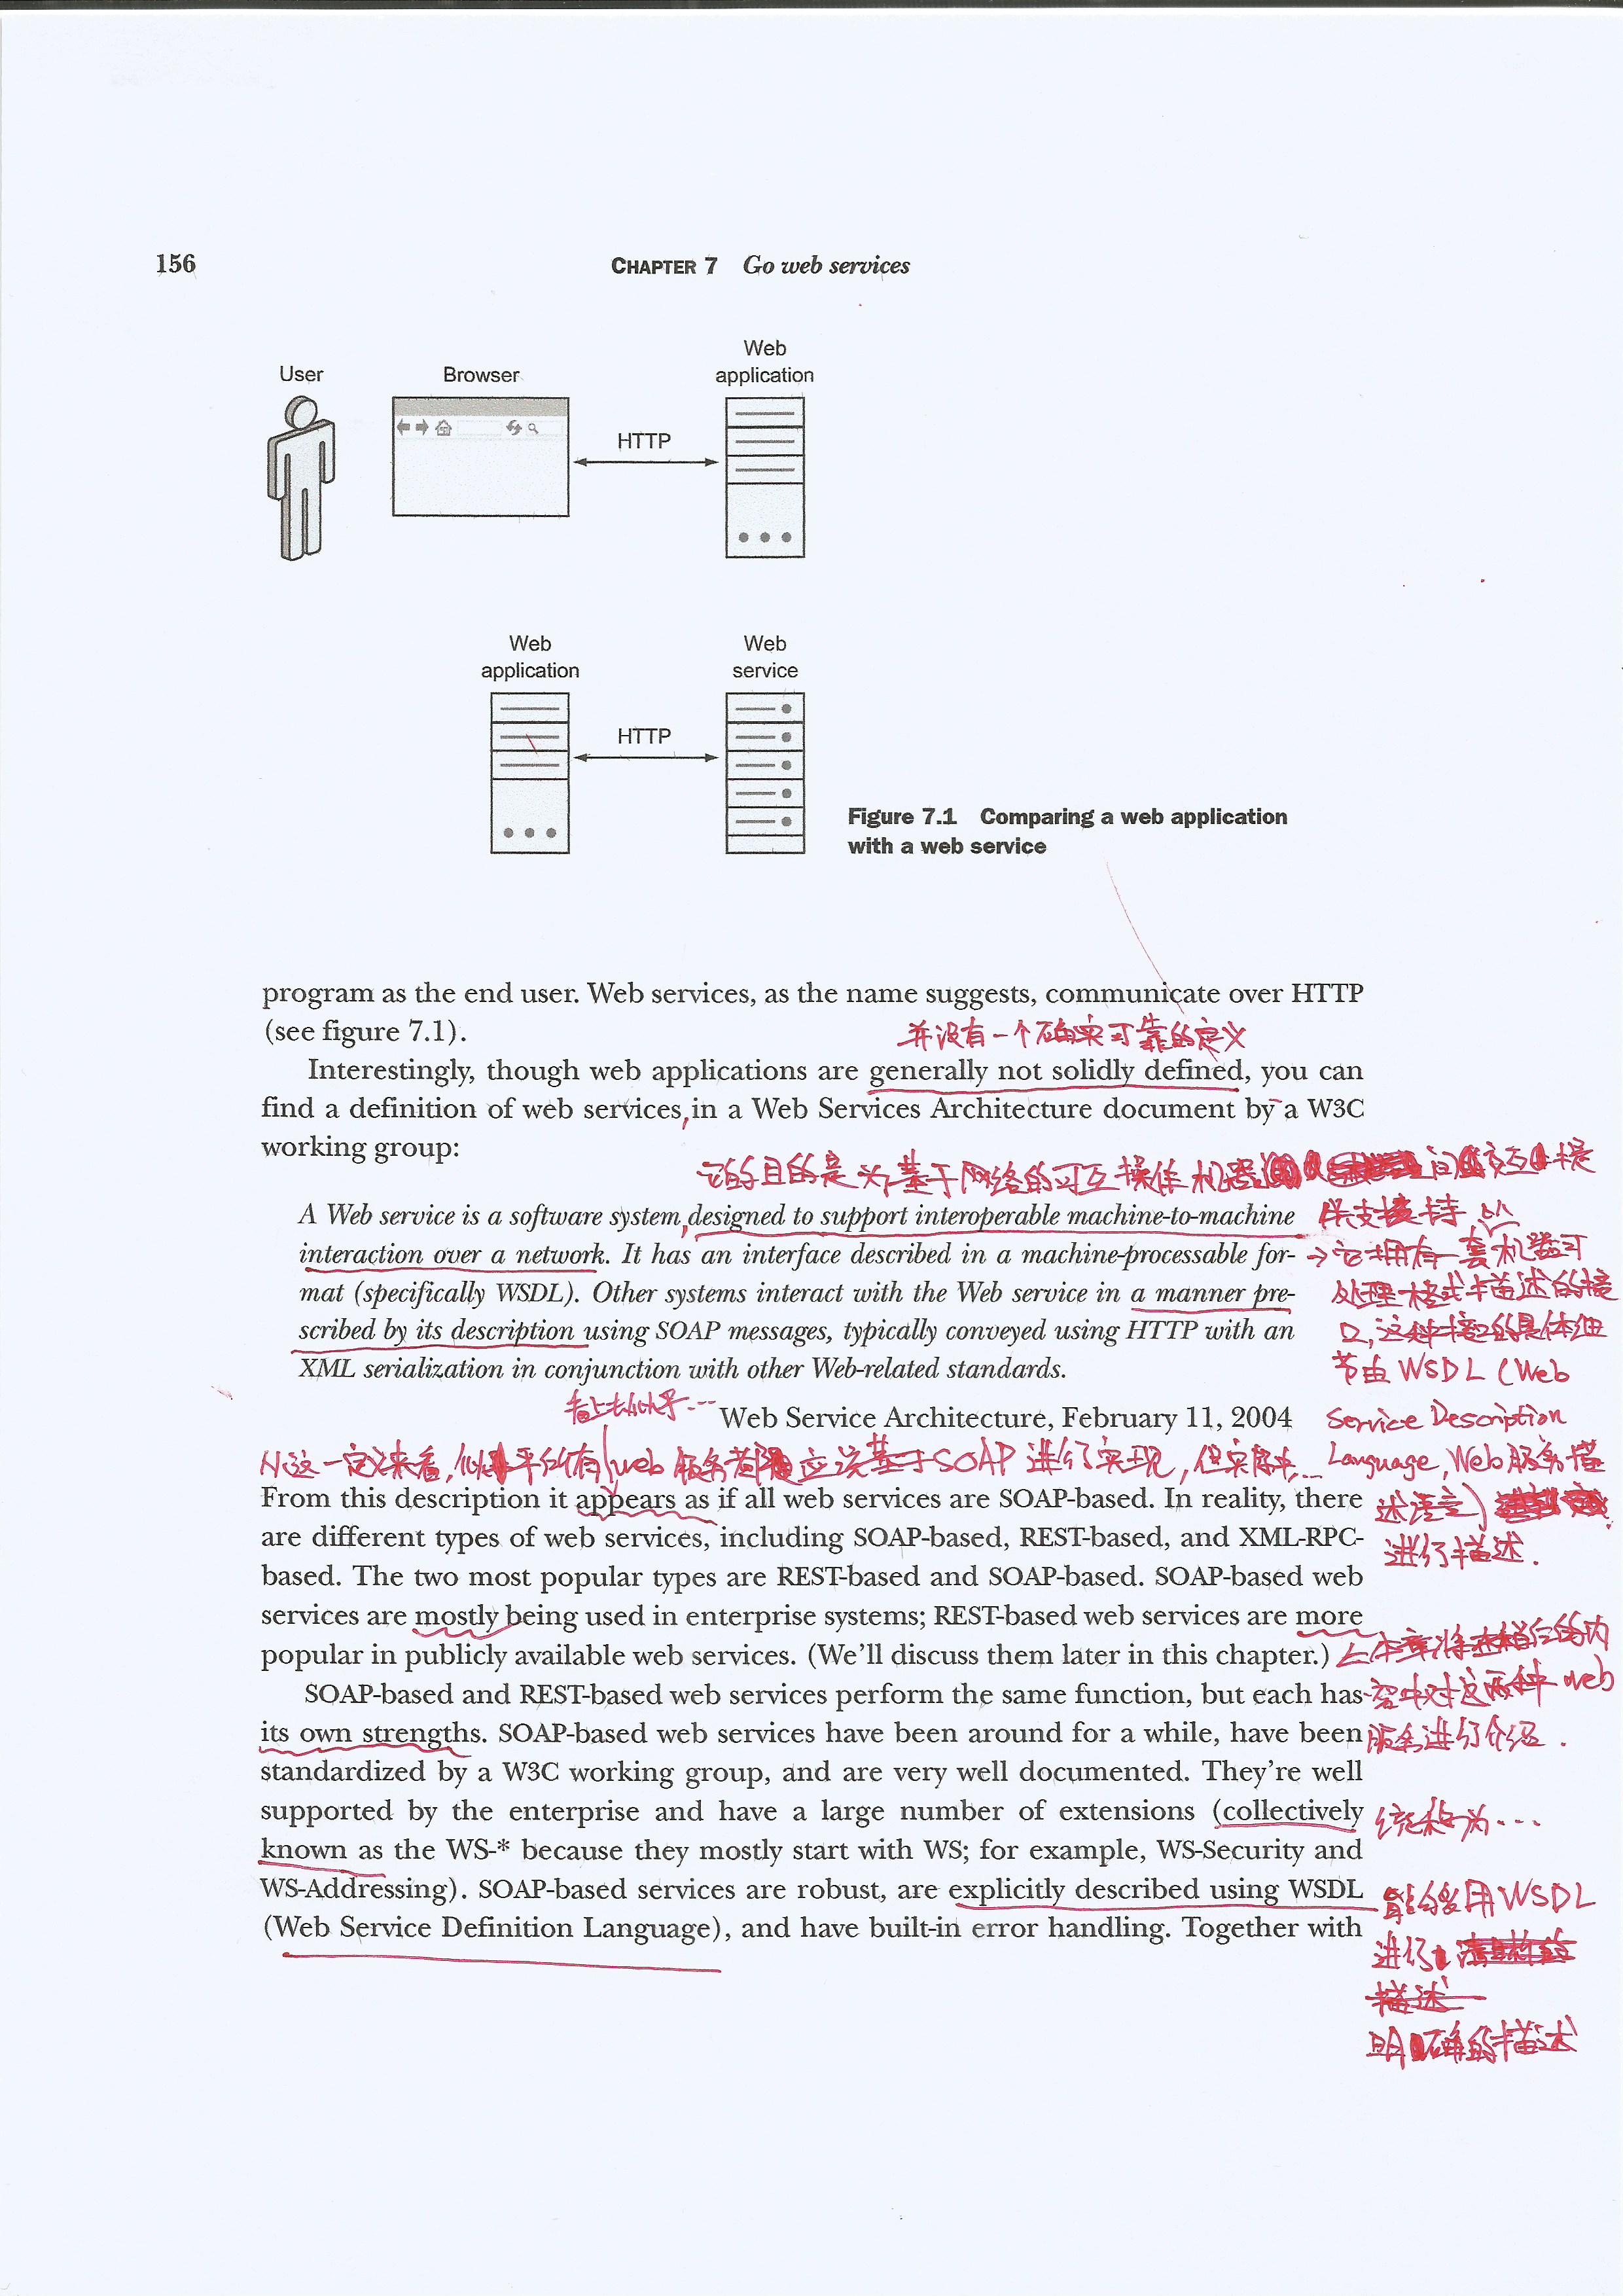 https://github.com/huangz1990/gwpcn-translation-manuscript/blob/master/page156.jpeg?raw=true